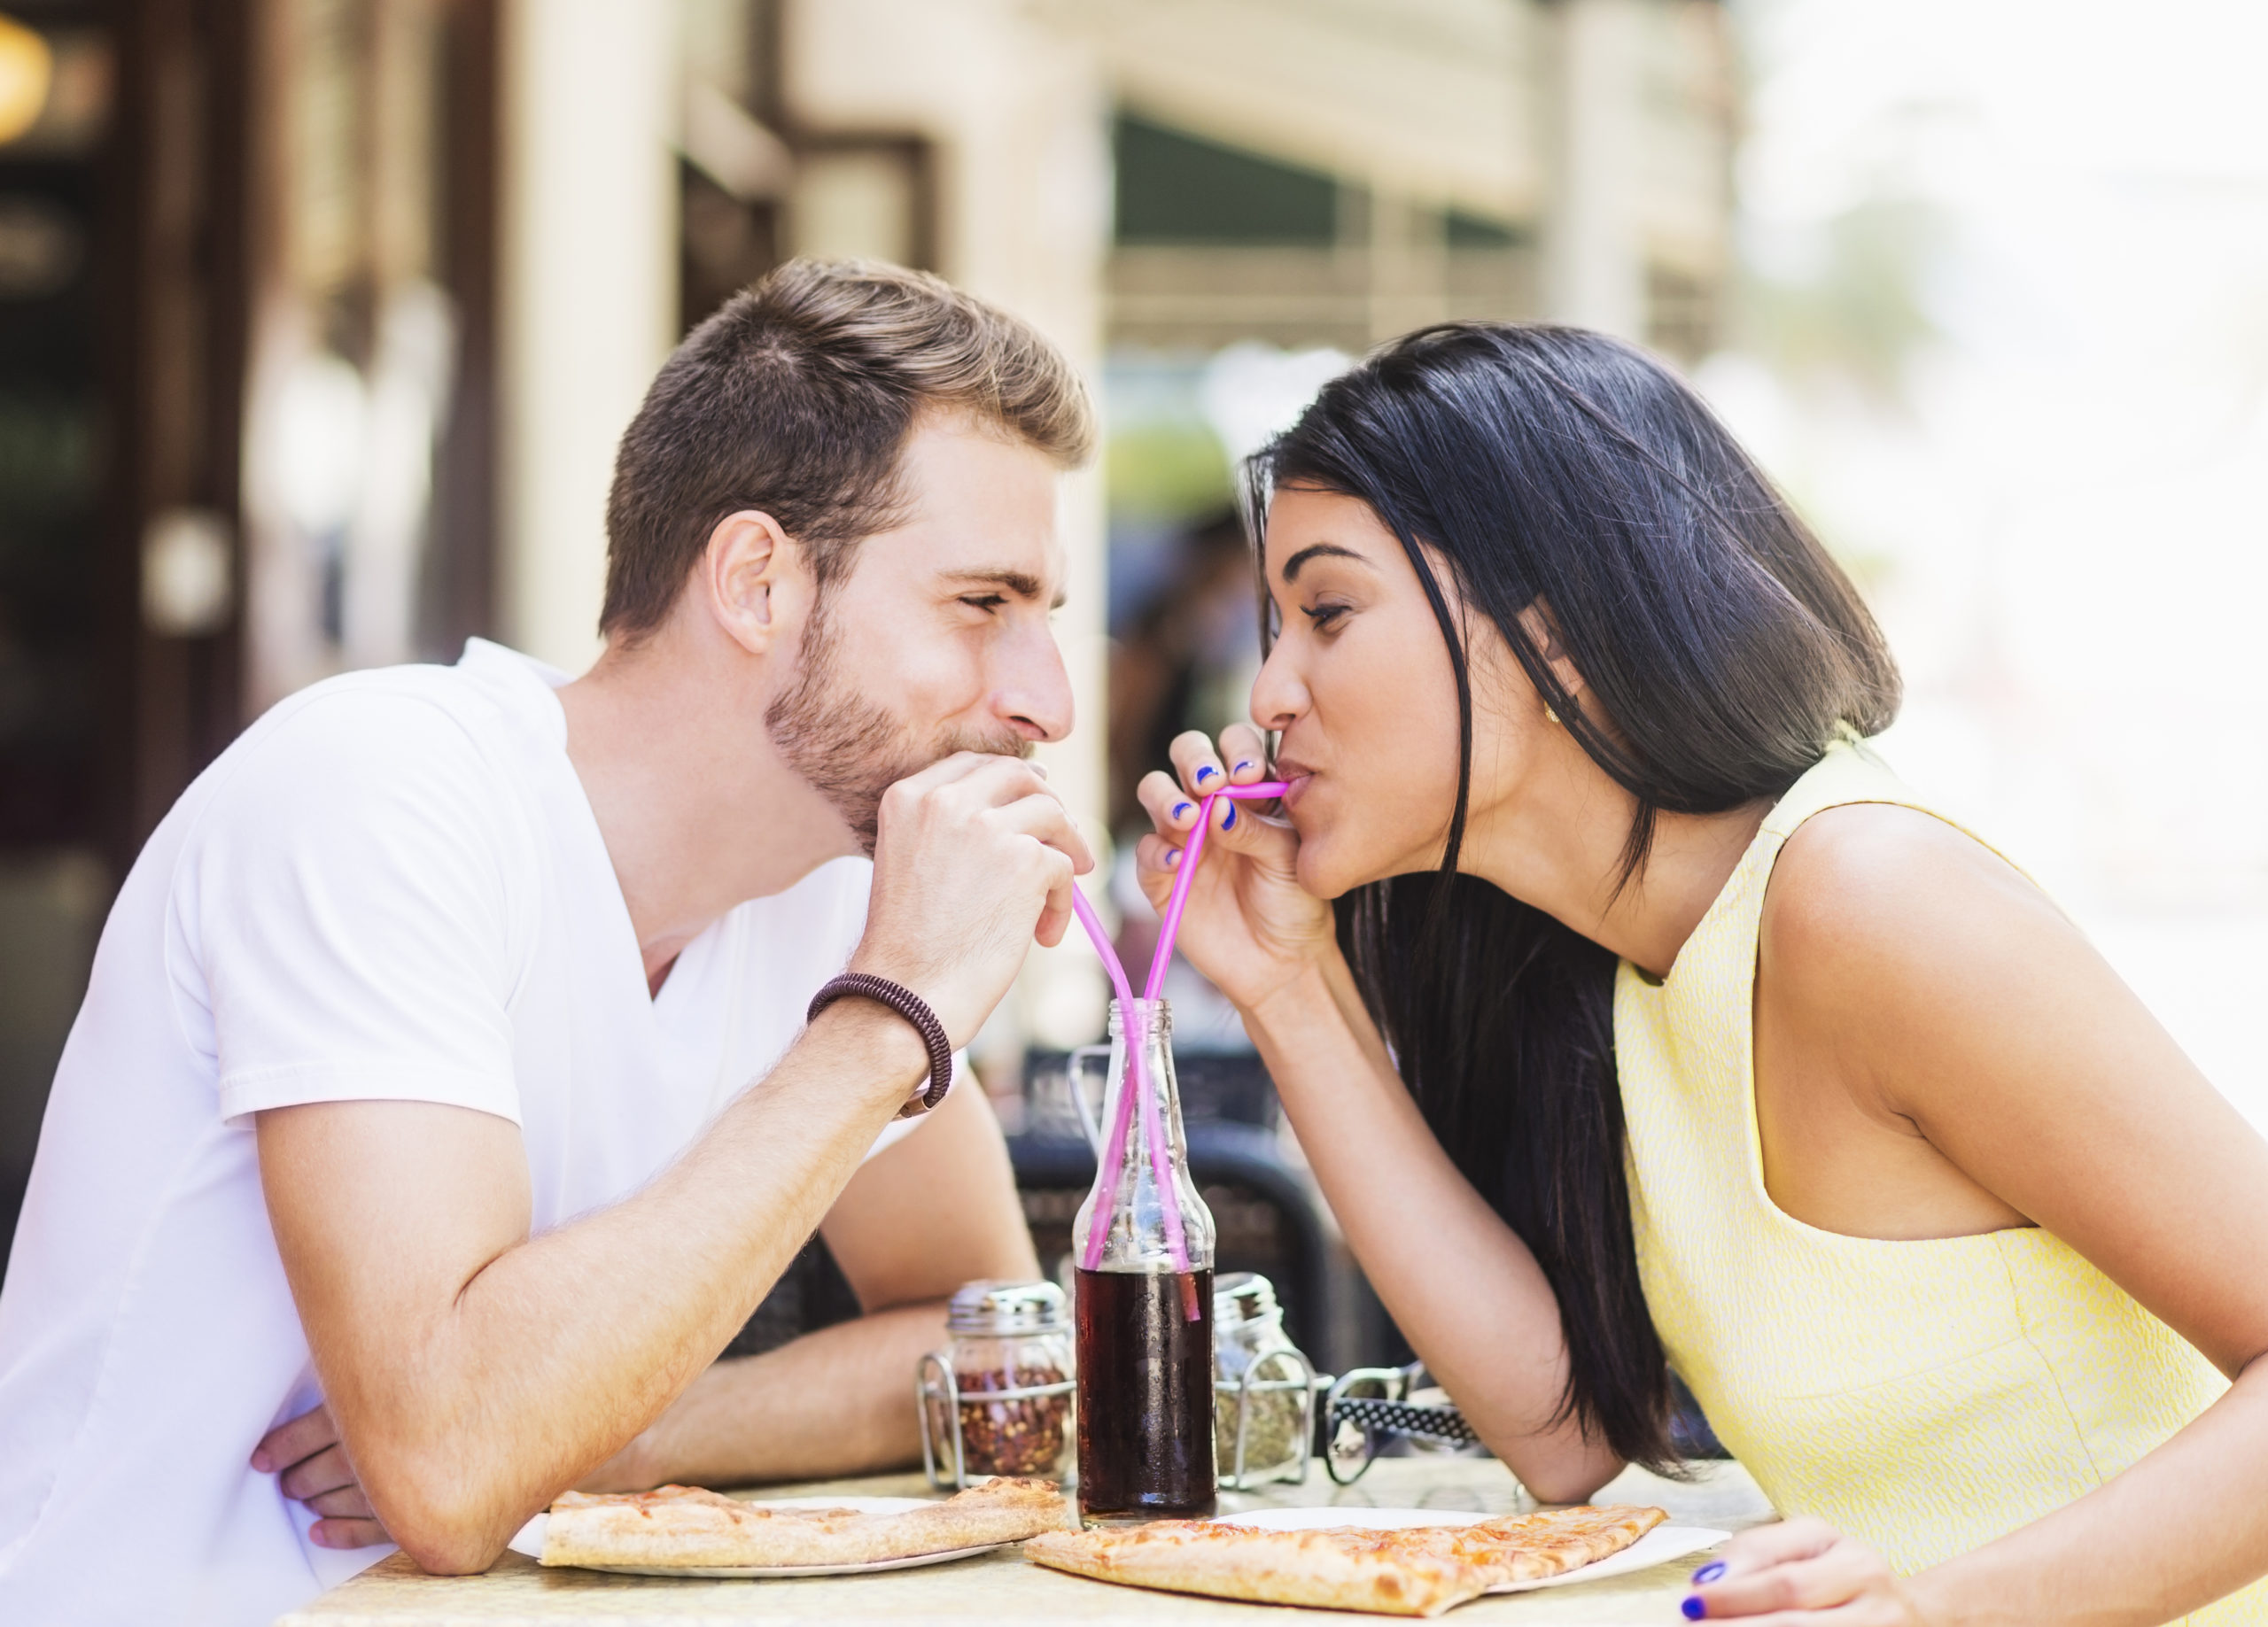 Dating Tips: Behaviors To Avoid When Dating